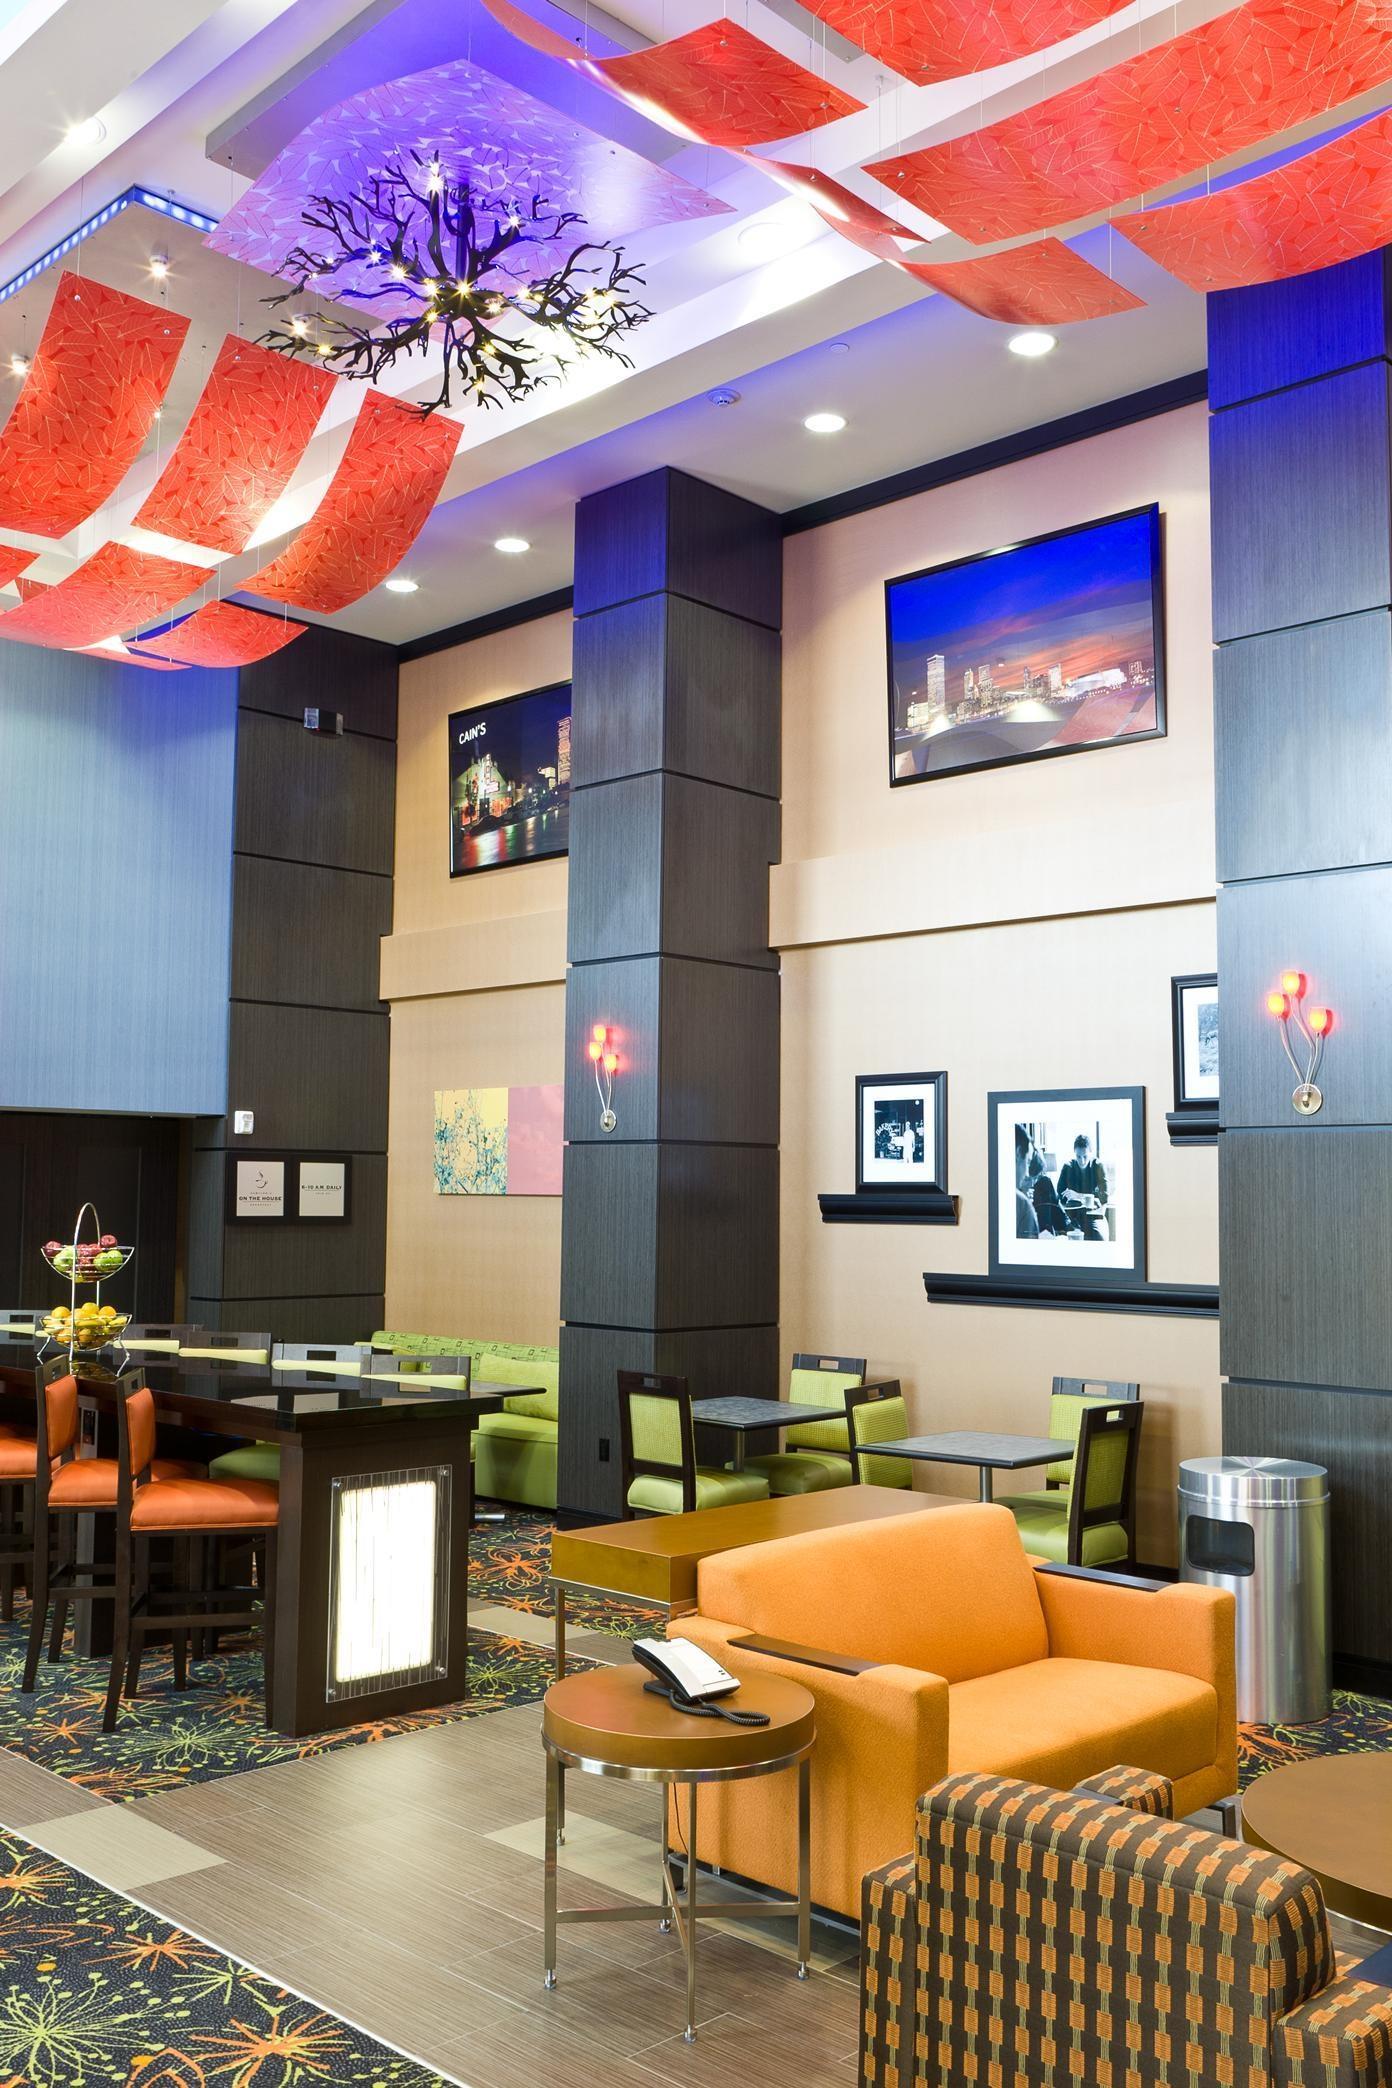 Hampton Inn & Suites Tulsa/Central image 0